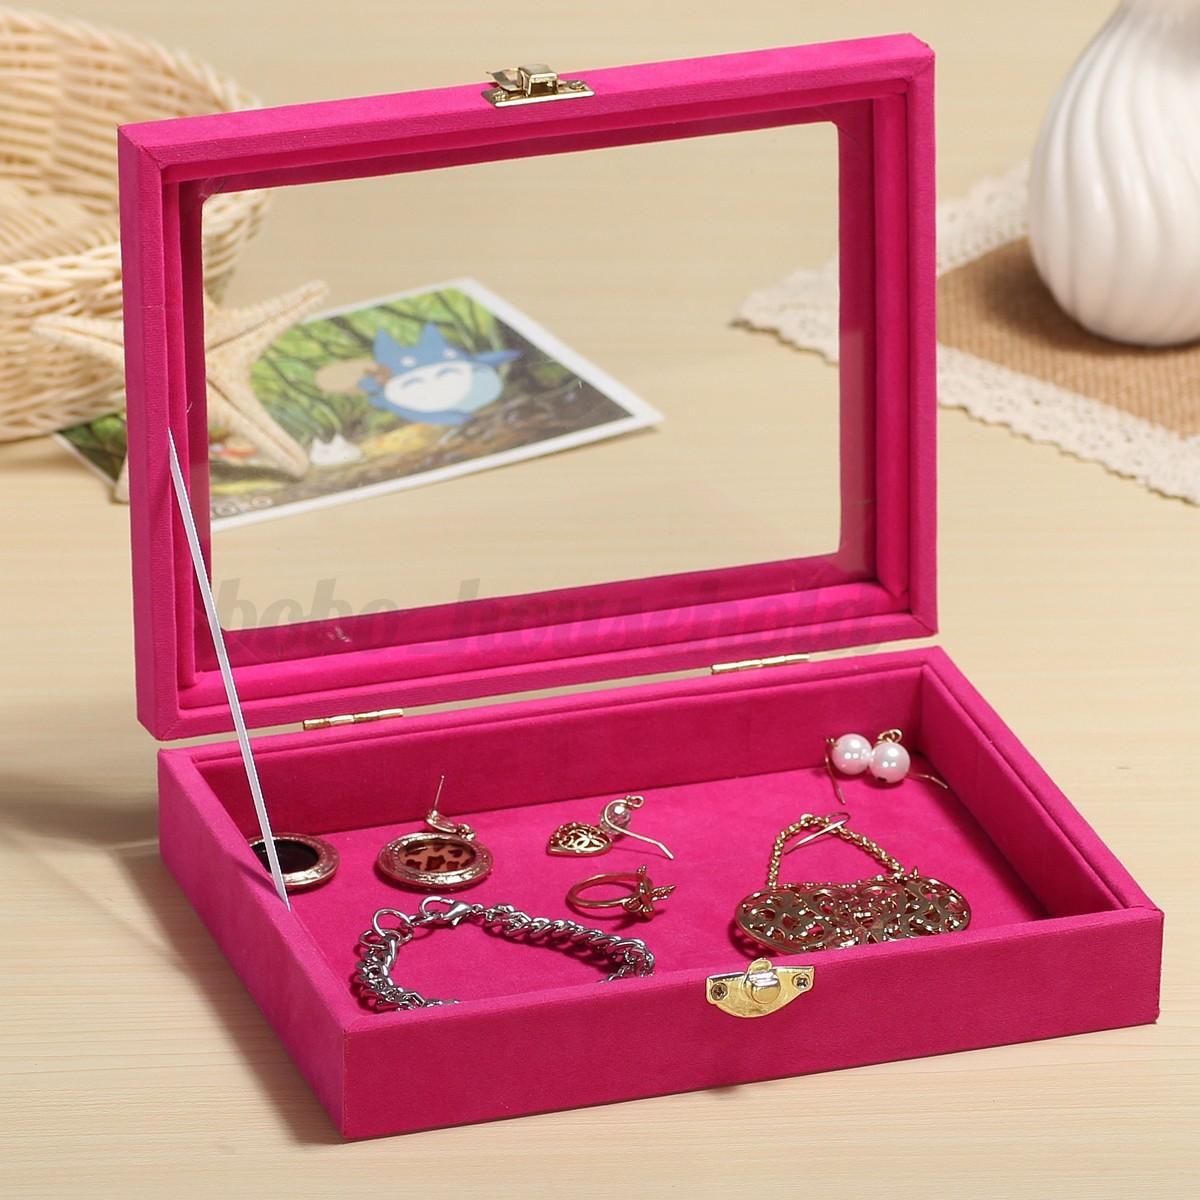 New velvet ring jewelry display organizer case tray holder for Velvet jewelry organizer trays